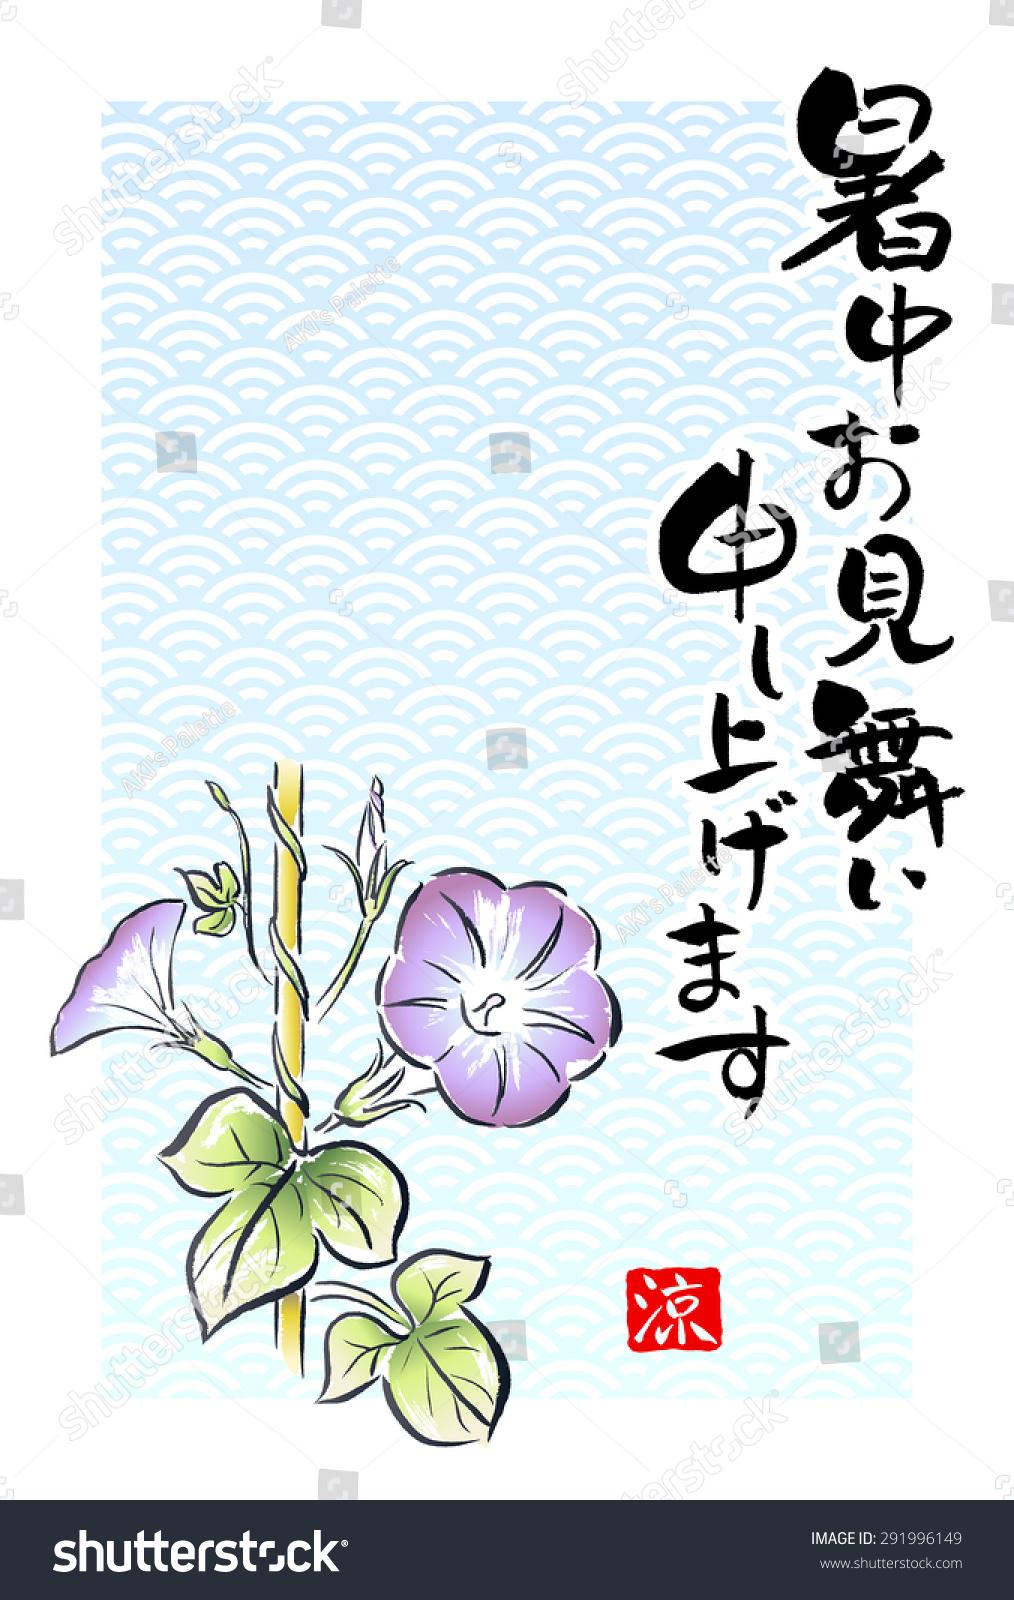 Japanese summer greeting card morning glory stock vector royalty japanese summer greeting card of morning glory summer greetings m4hsunfo